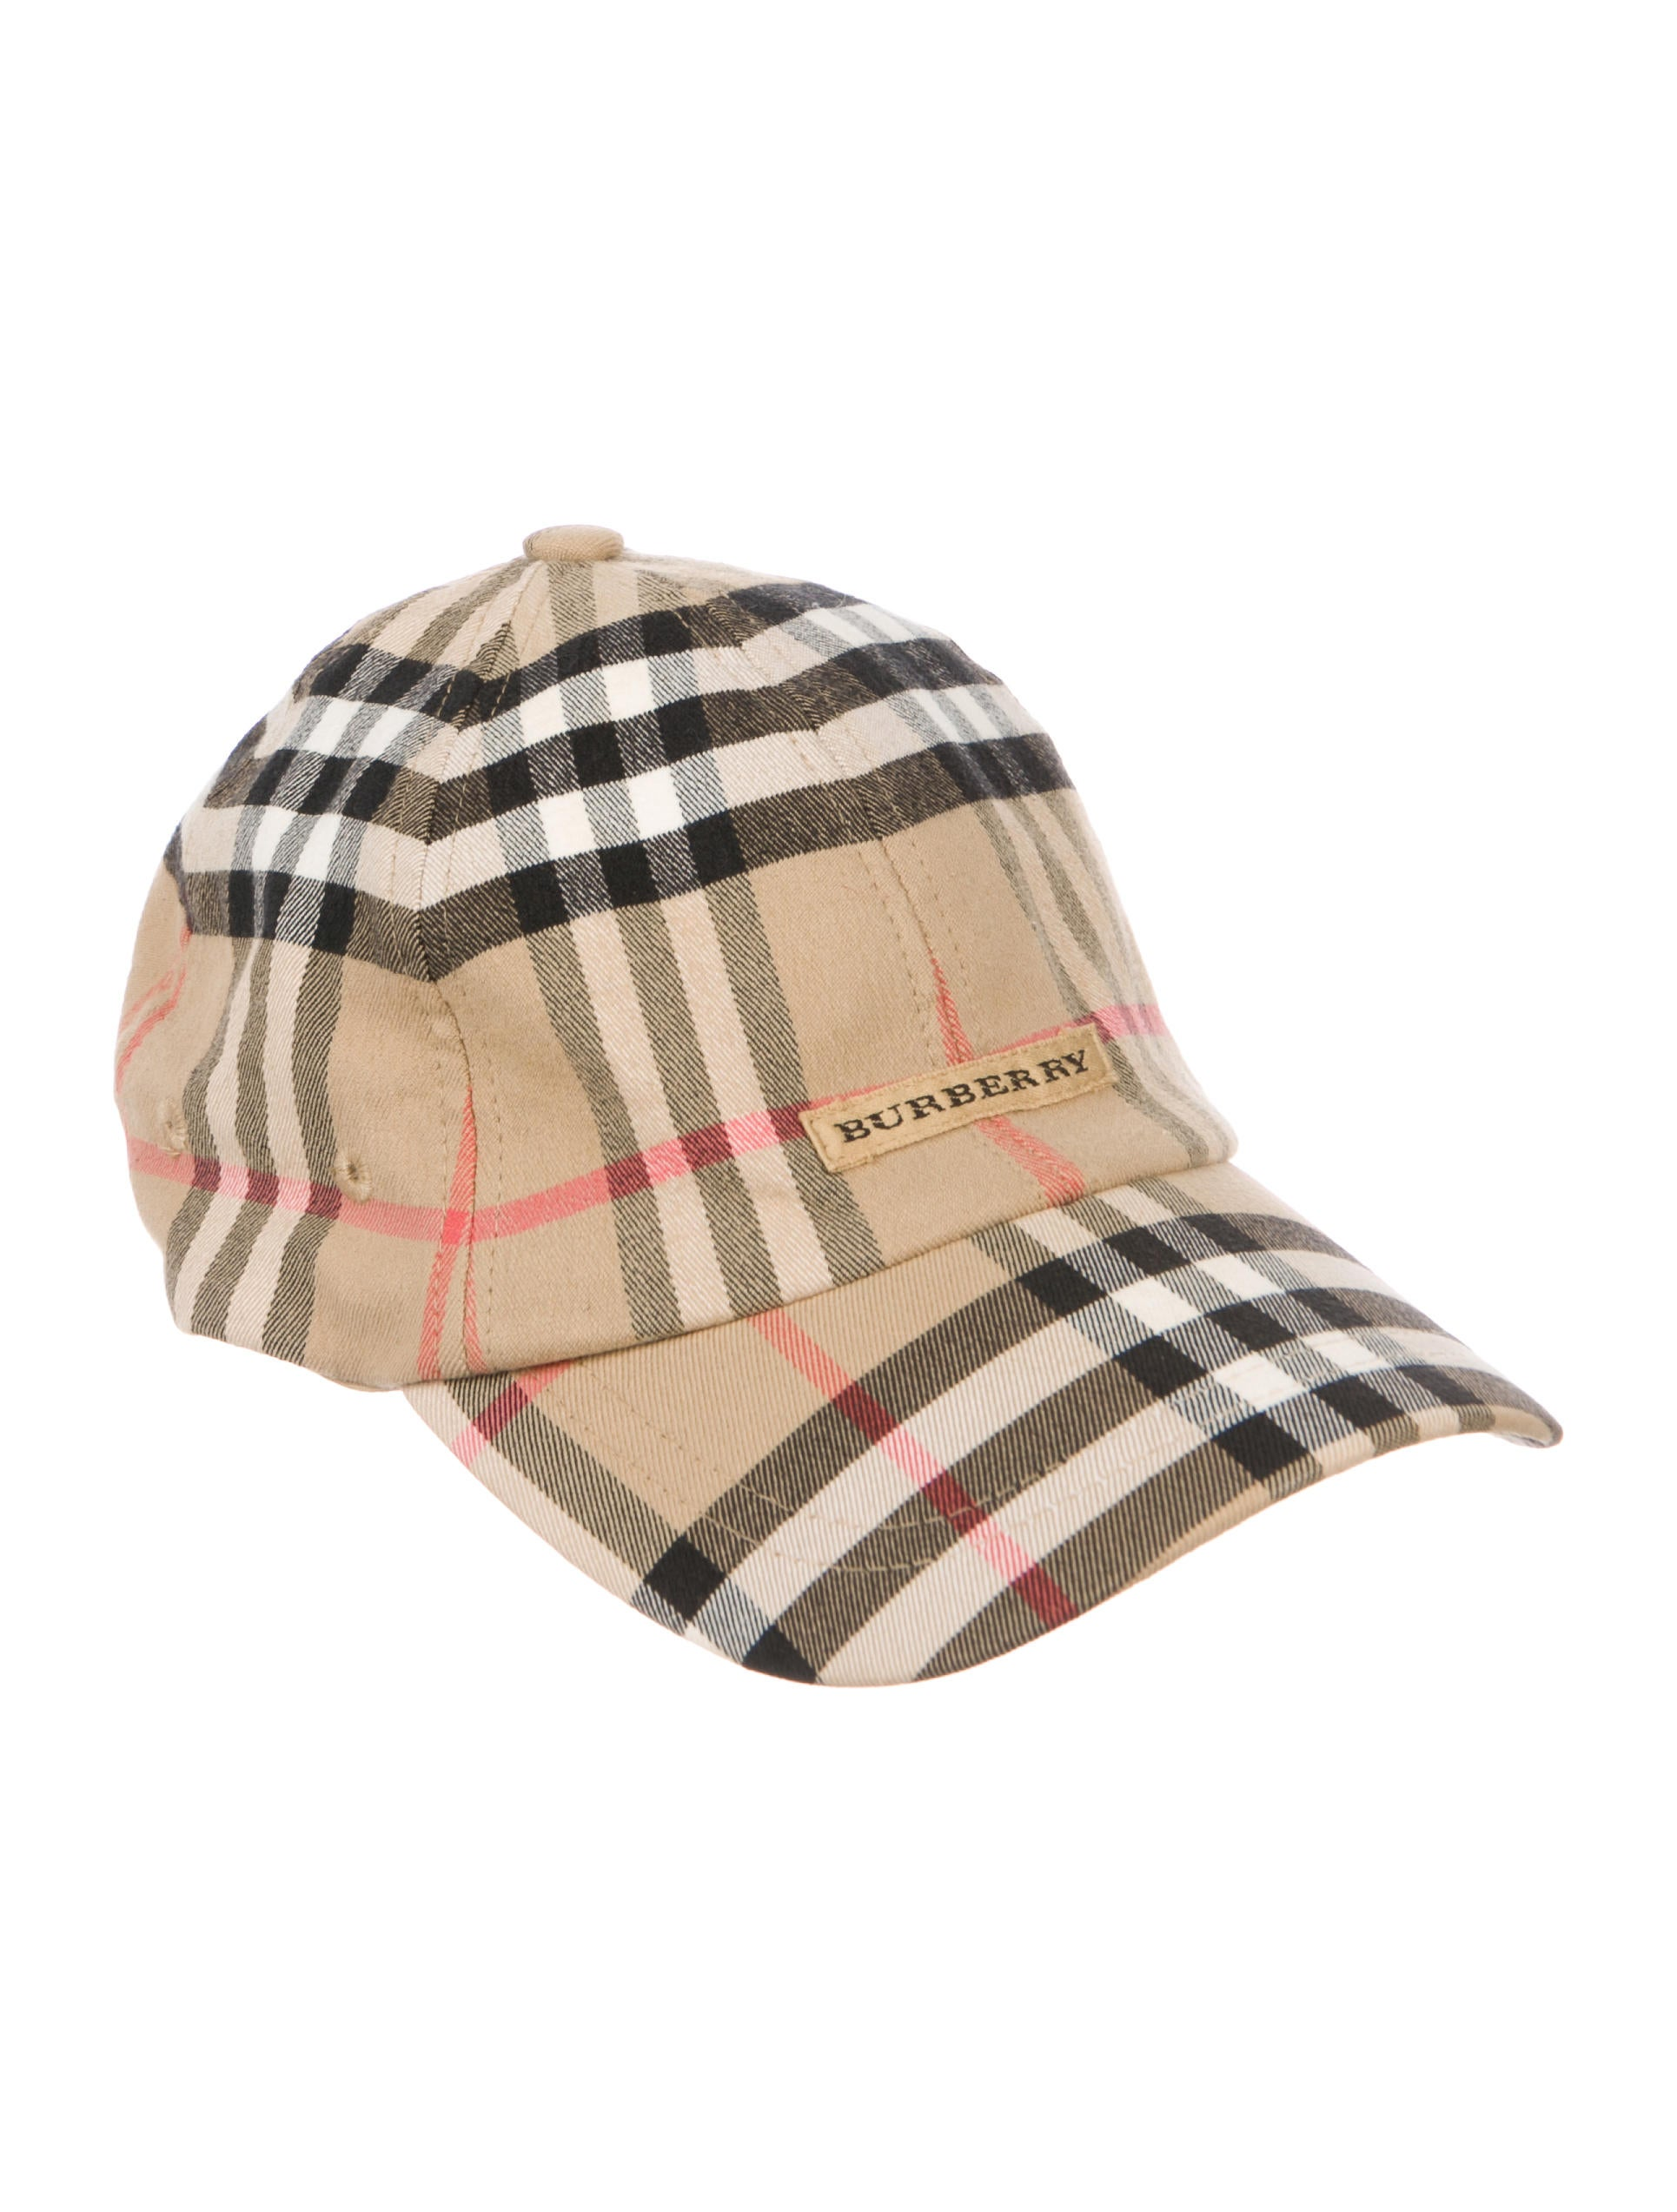 Burberry Golf Nova Check Cap - Accessories - WBRBG20131  13a574495b91